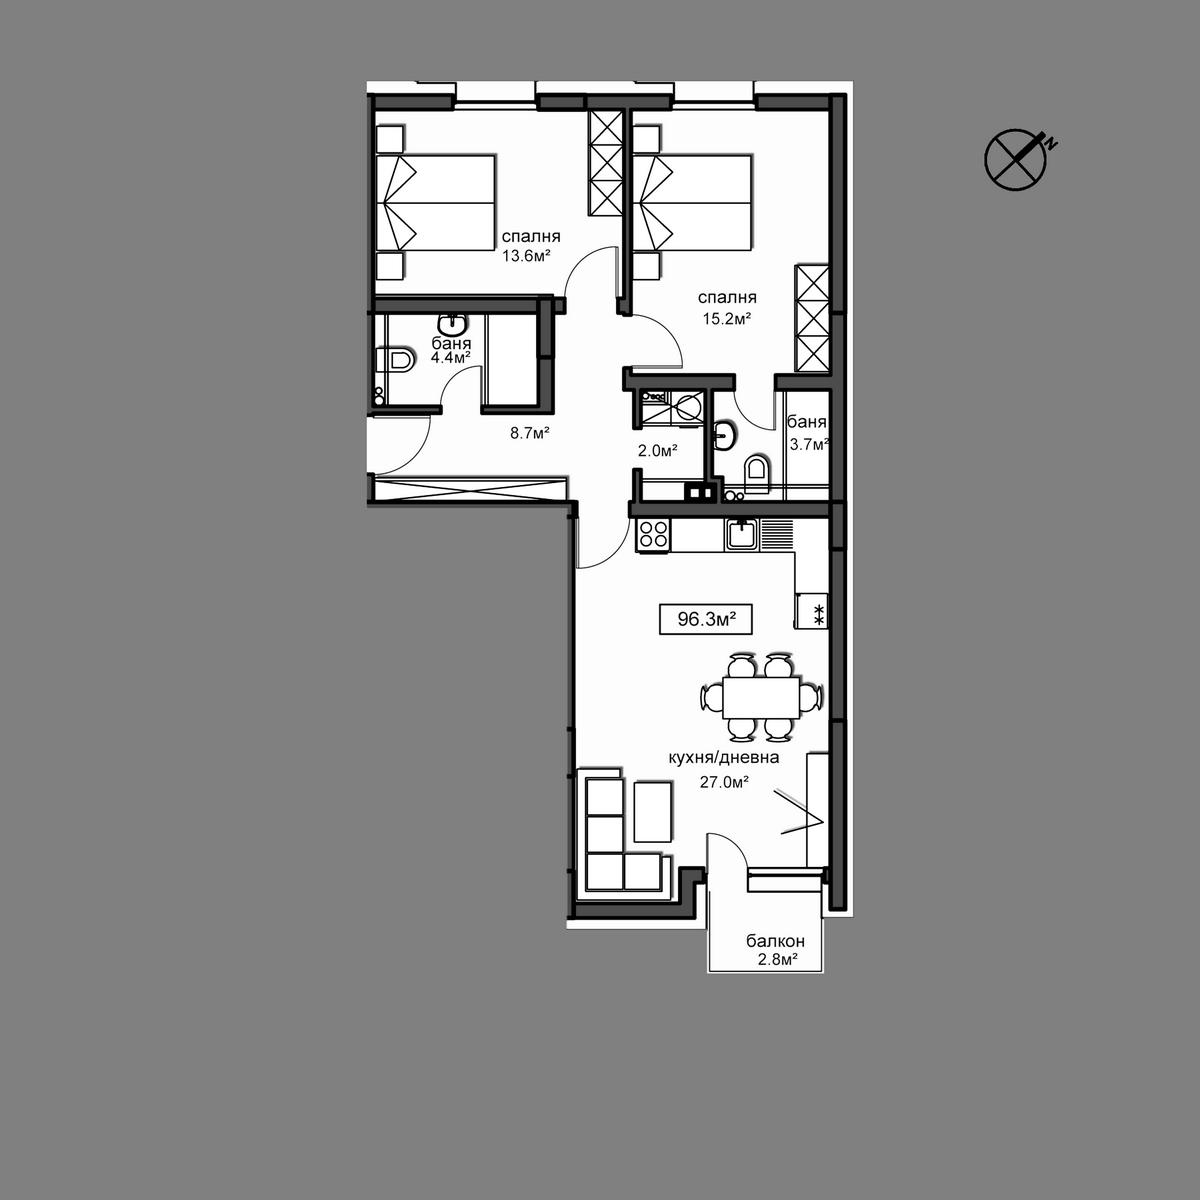 Продава апартамент - Апартамент  Б18